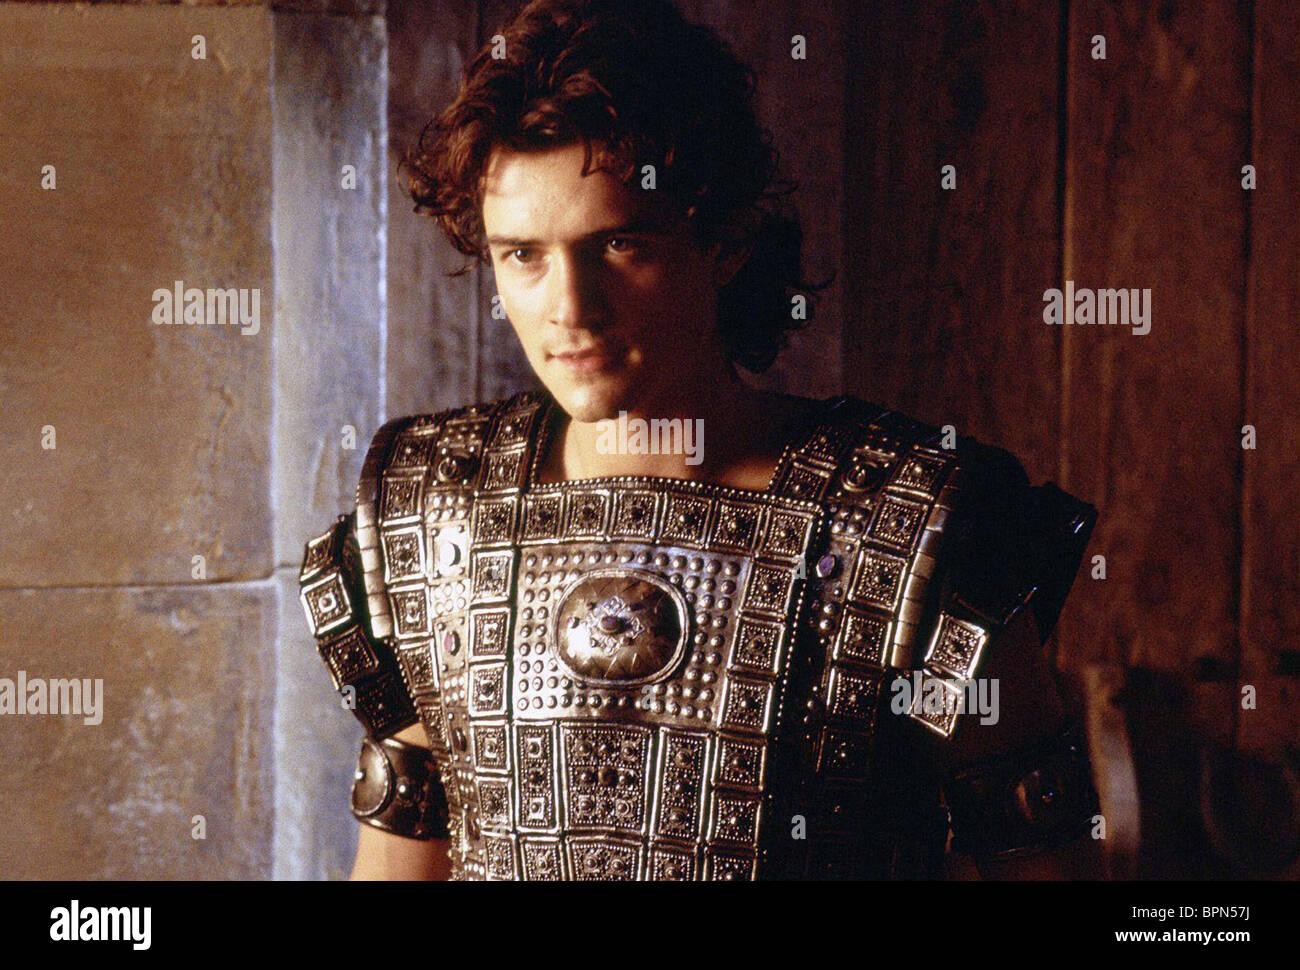 Orlando Bloom Troy 2004 Stock Photo Alamy